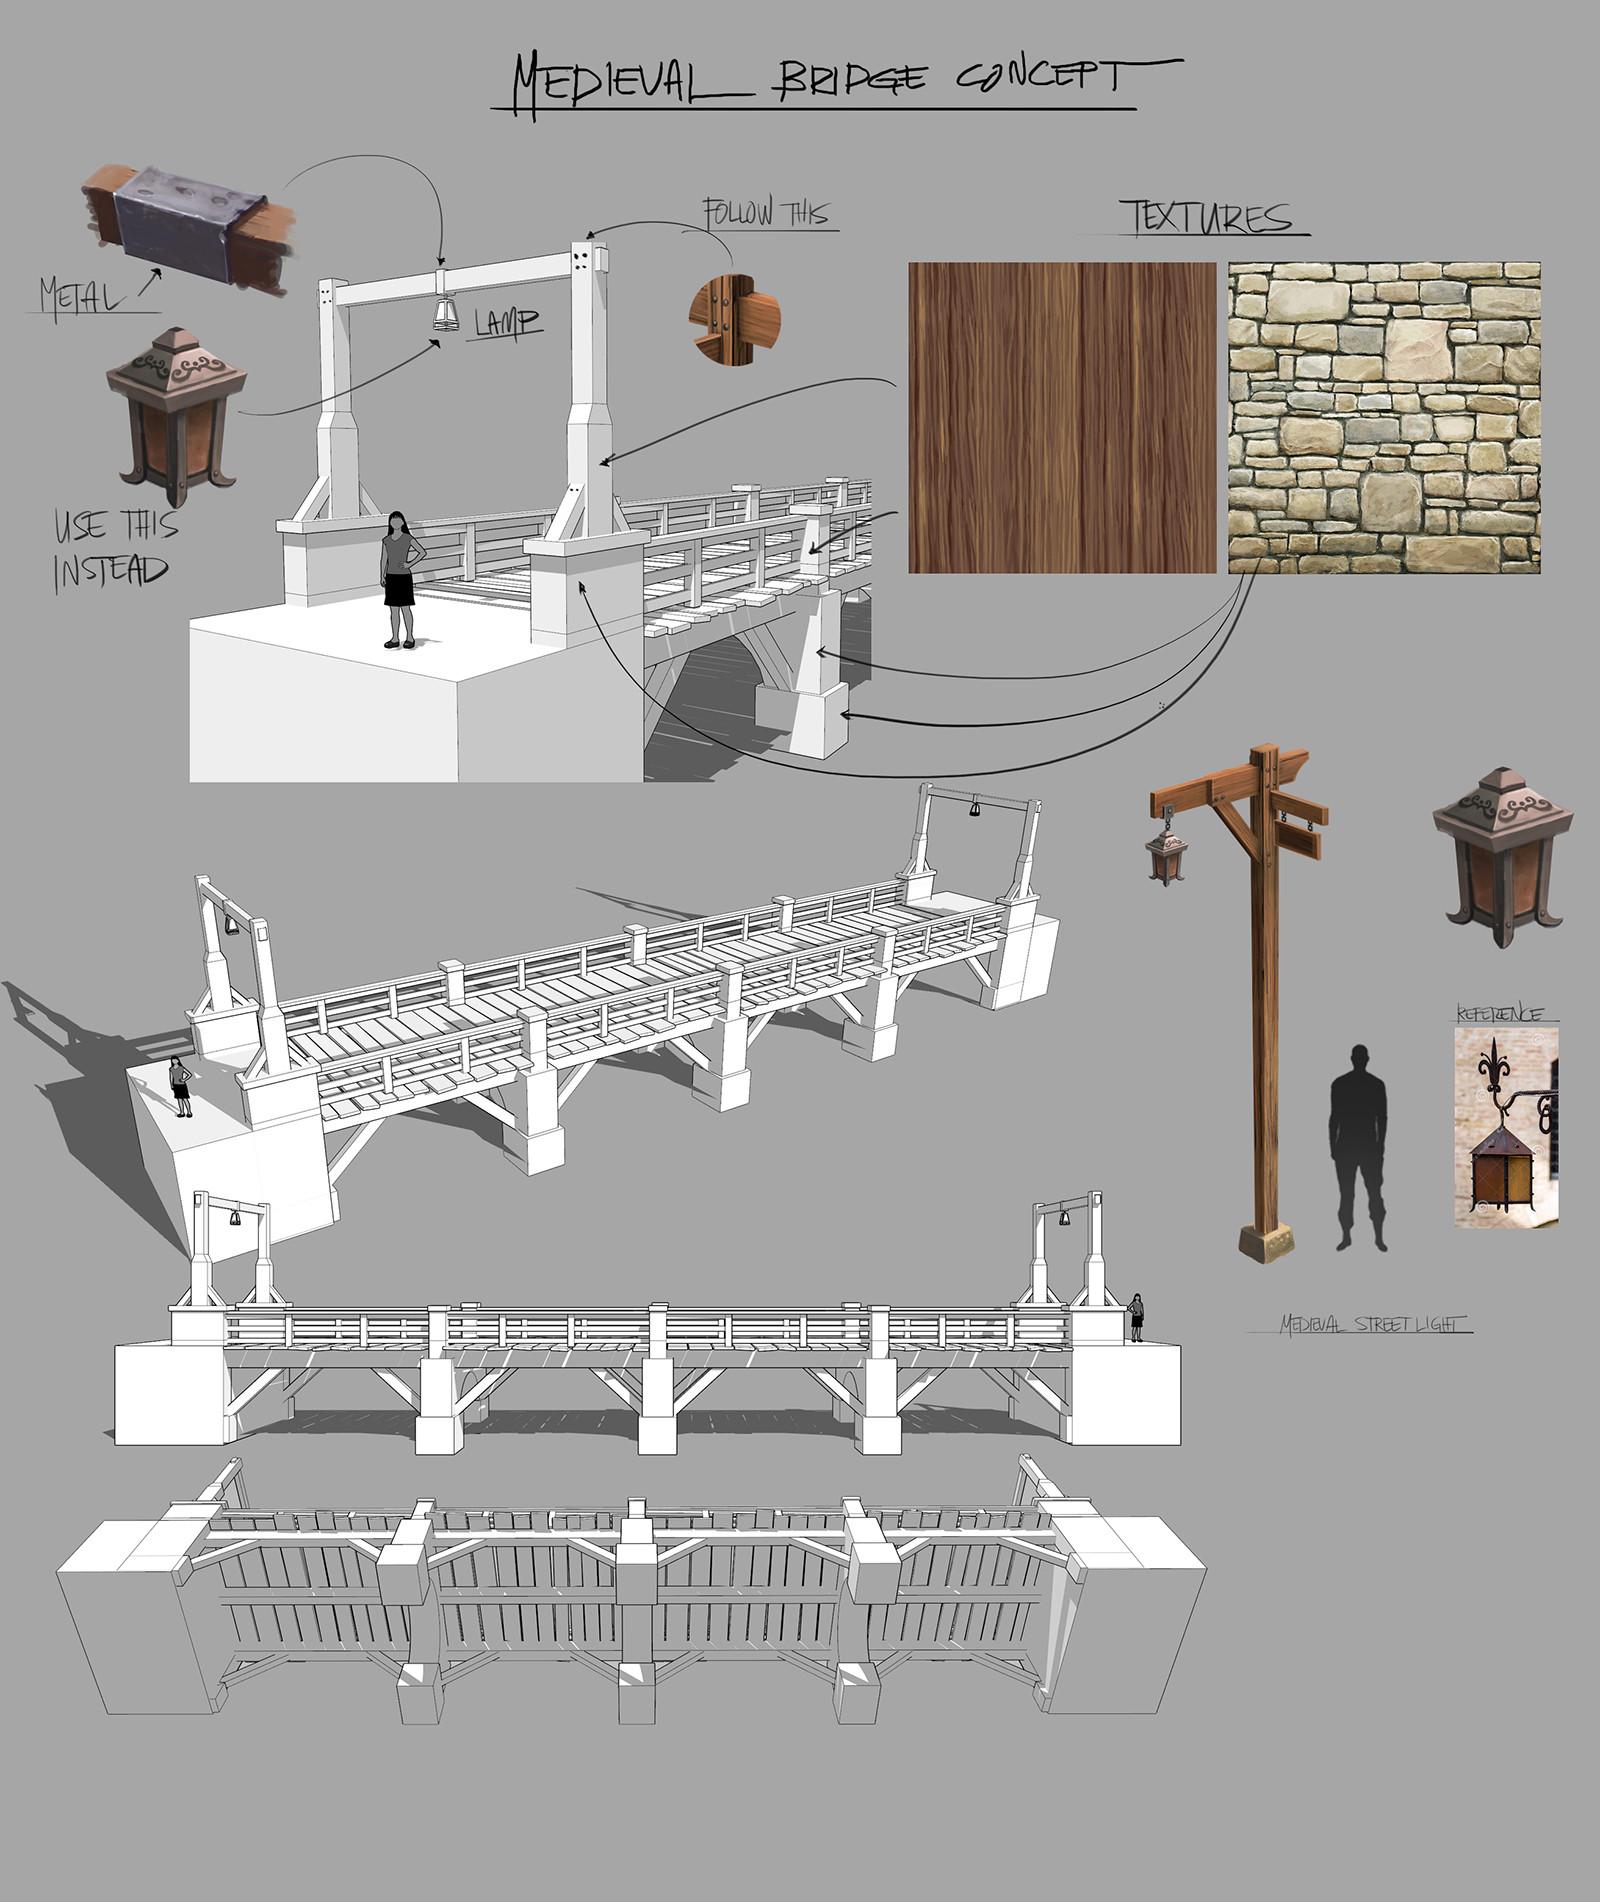 Ferdinand ladera medieval bridge conceptart